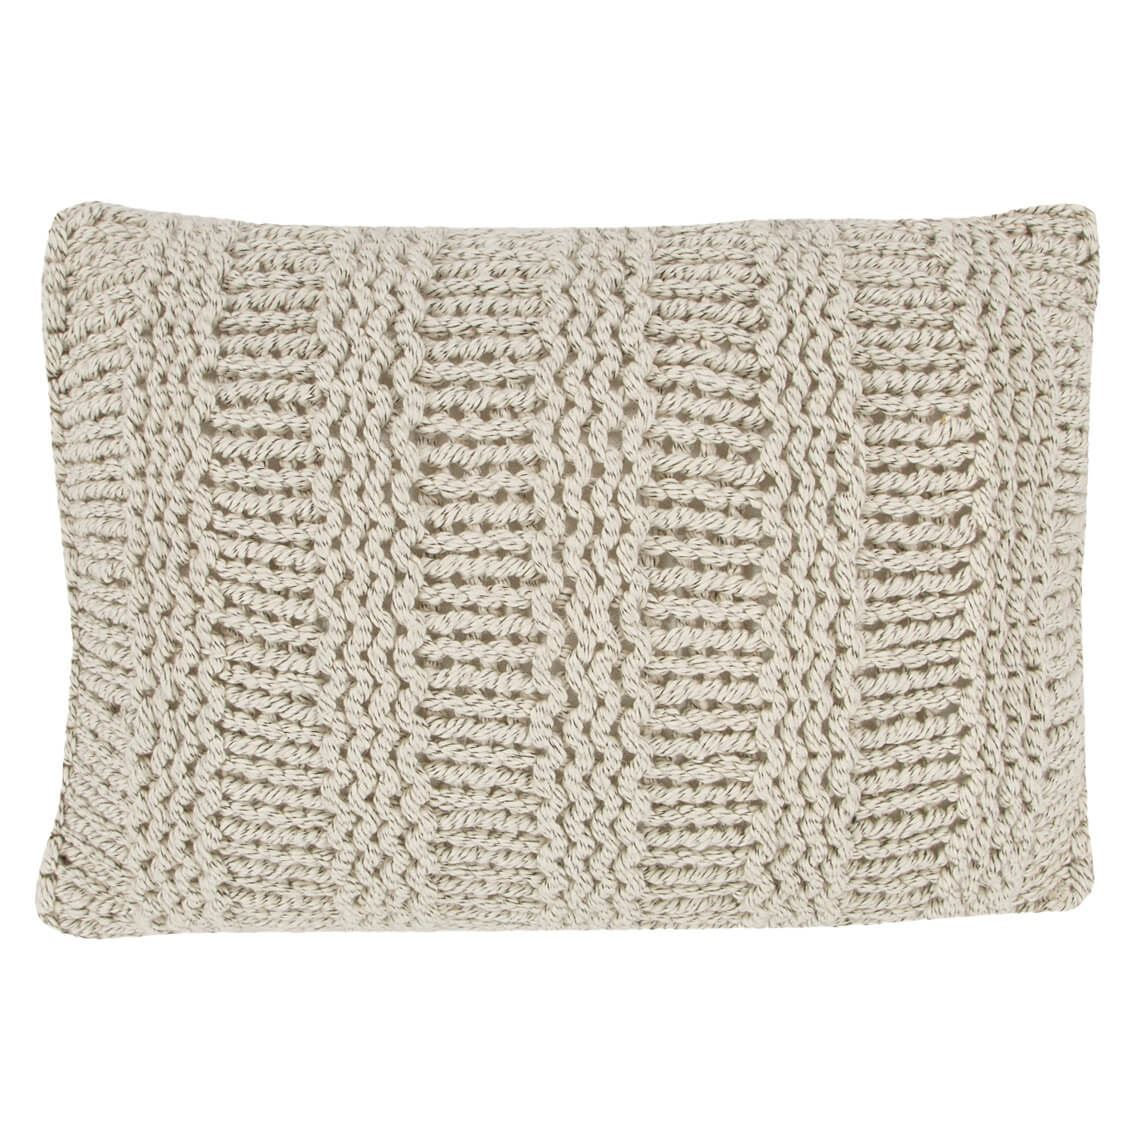 Dilalla Cushion Size W 32cm x D 10cm x H 47cm in Natural Freedom